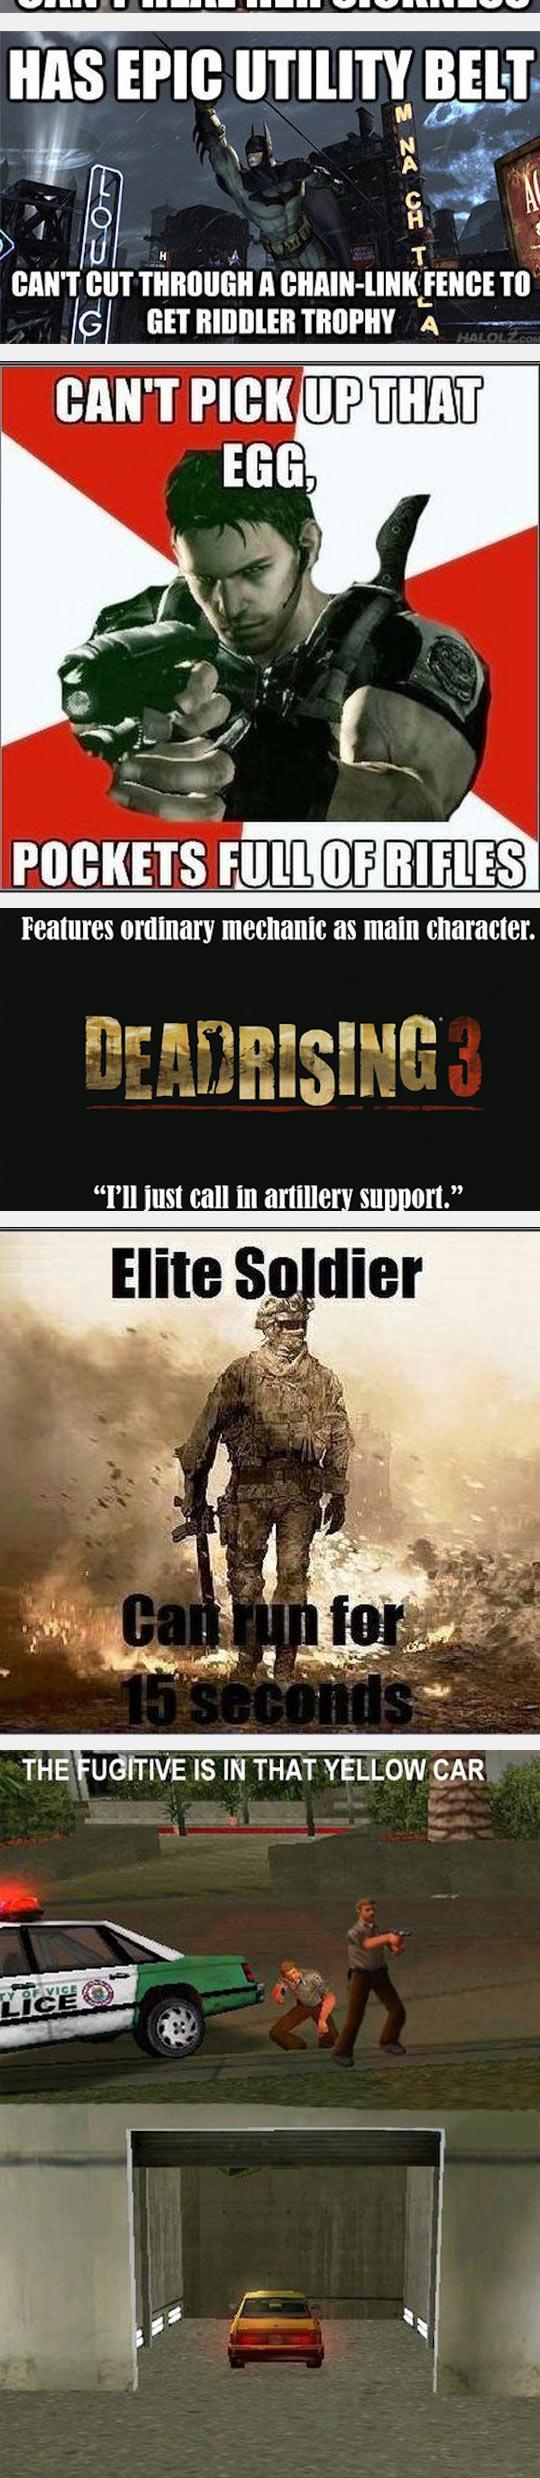 funny-video-game-GTA-logic-Dead-Rising